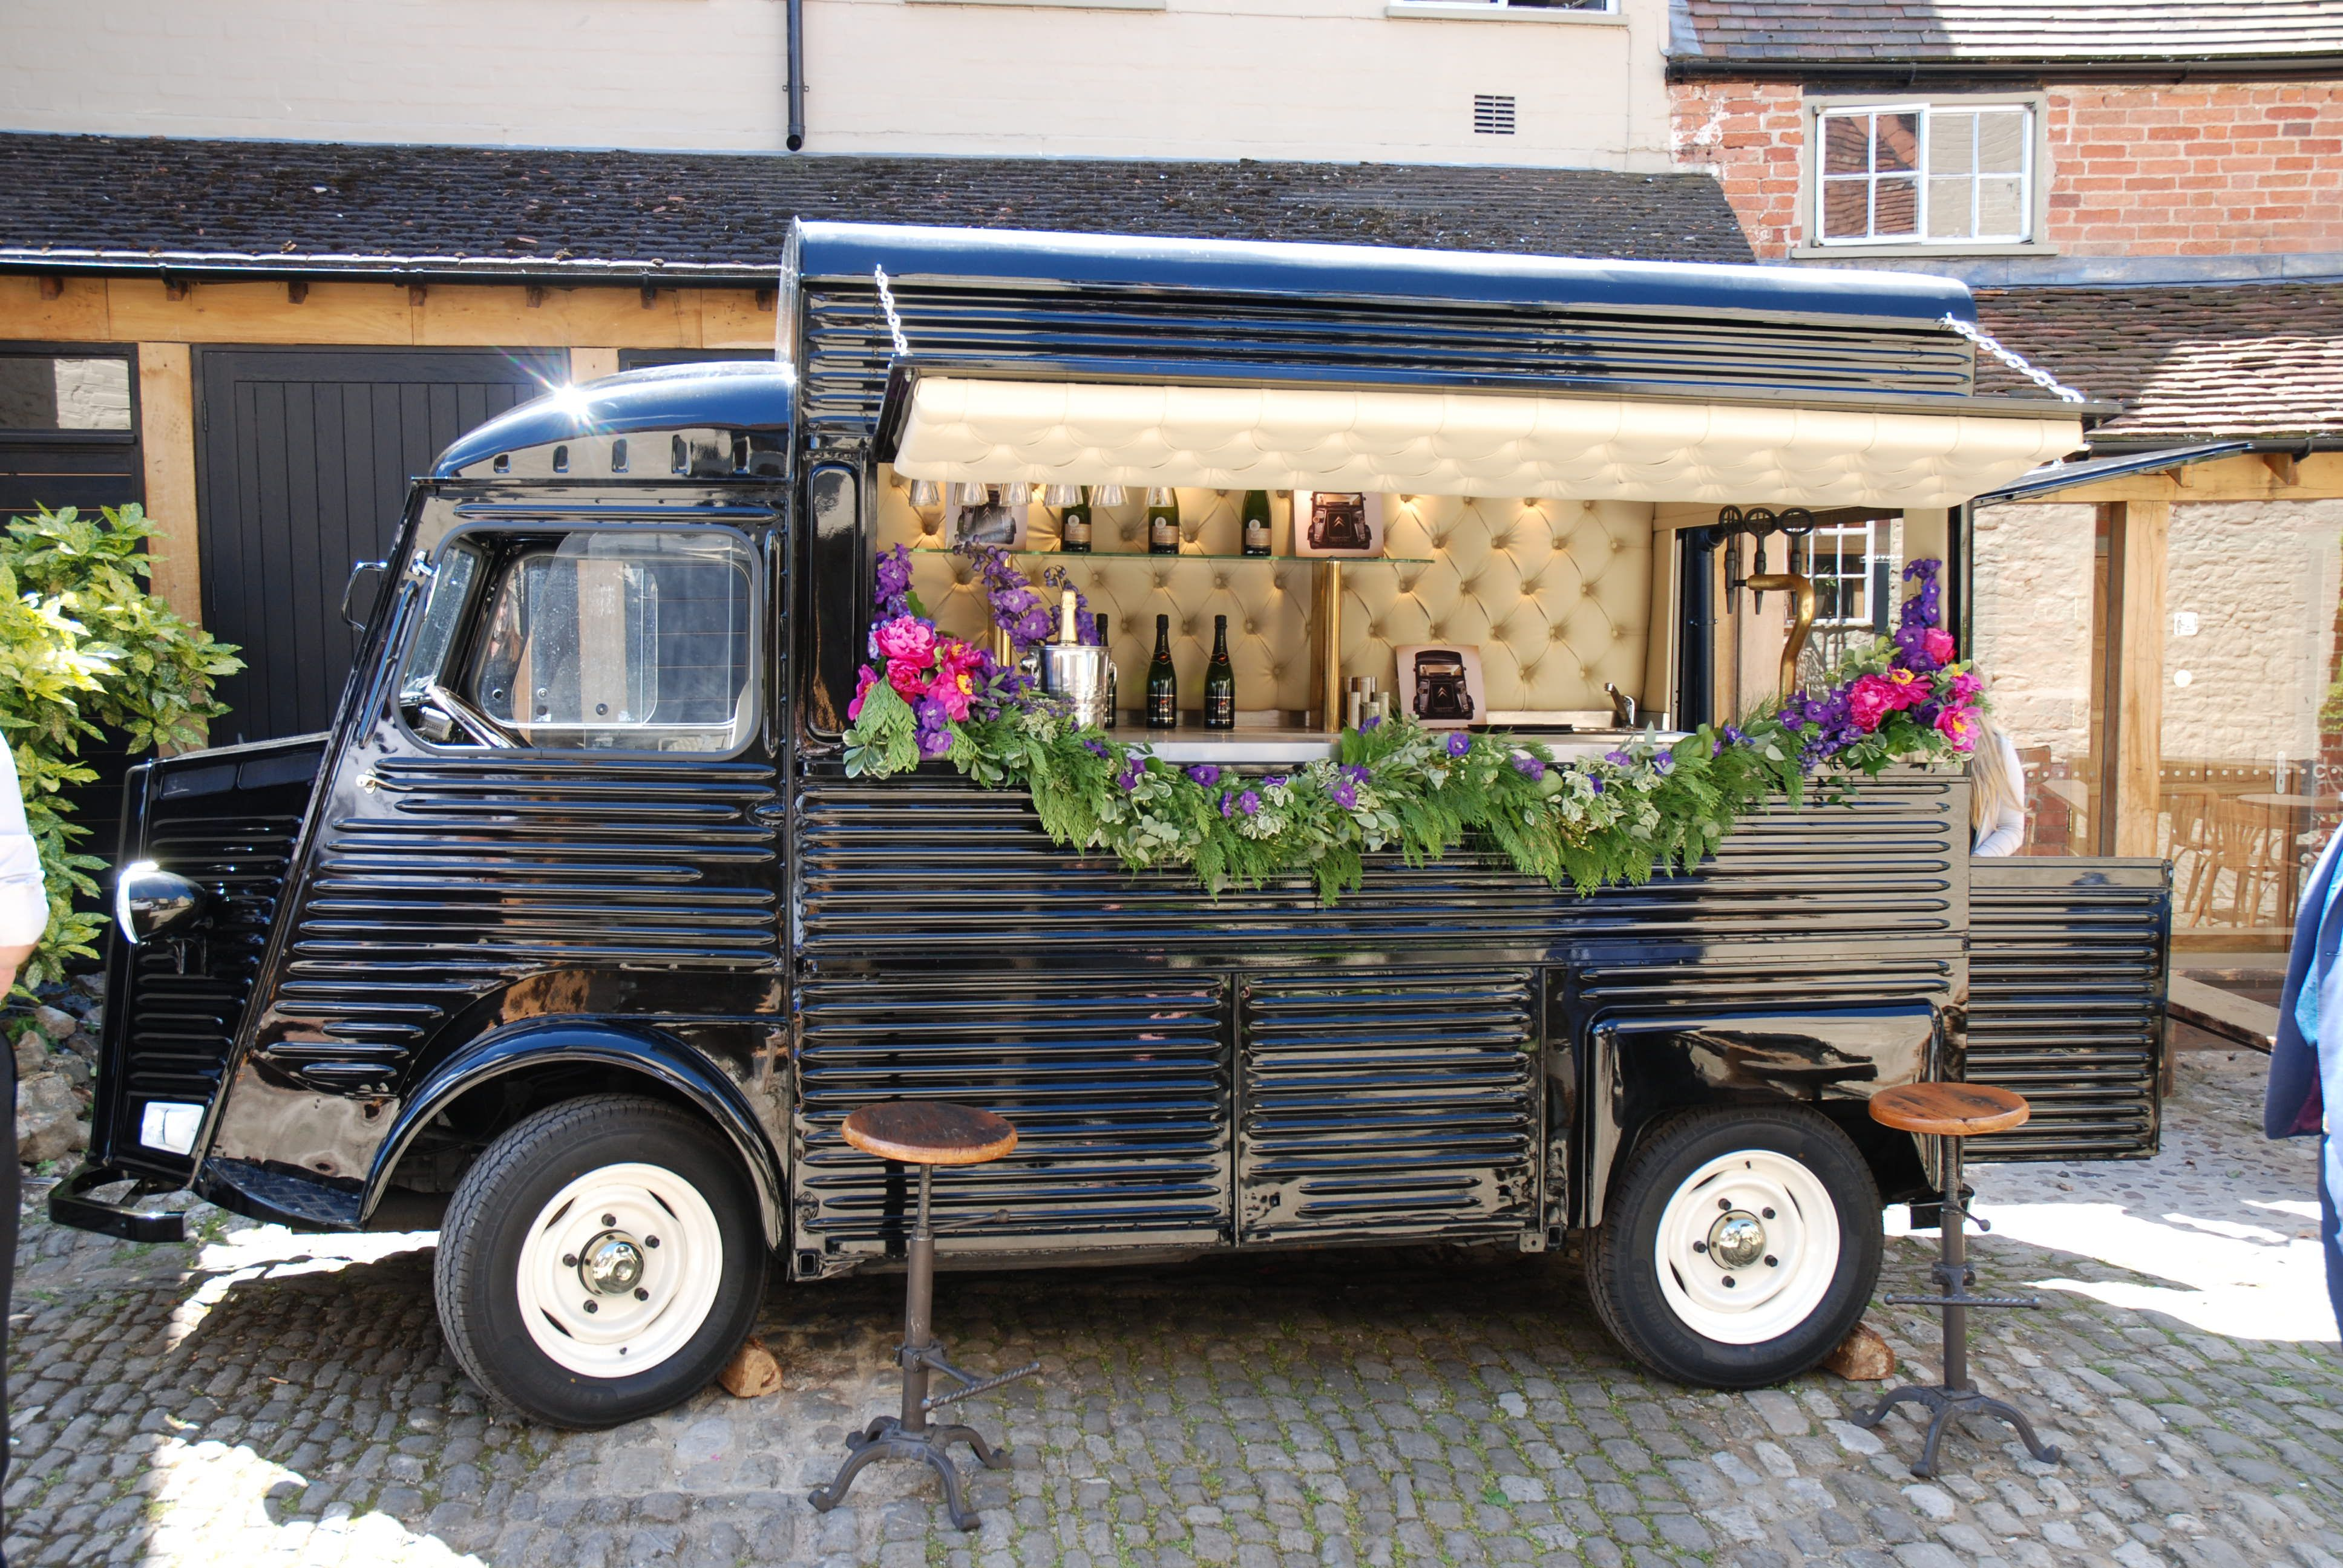 Bar De Cru Is A Mobile Cocktail That Rolls In Restored Citroen H Van Catering VanCatering TrailerWedding